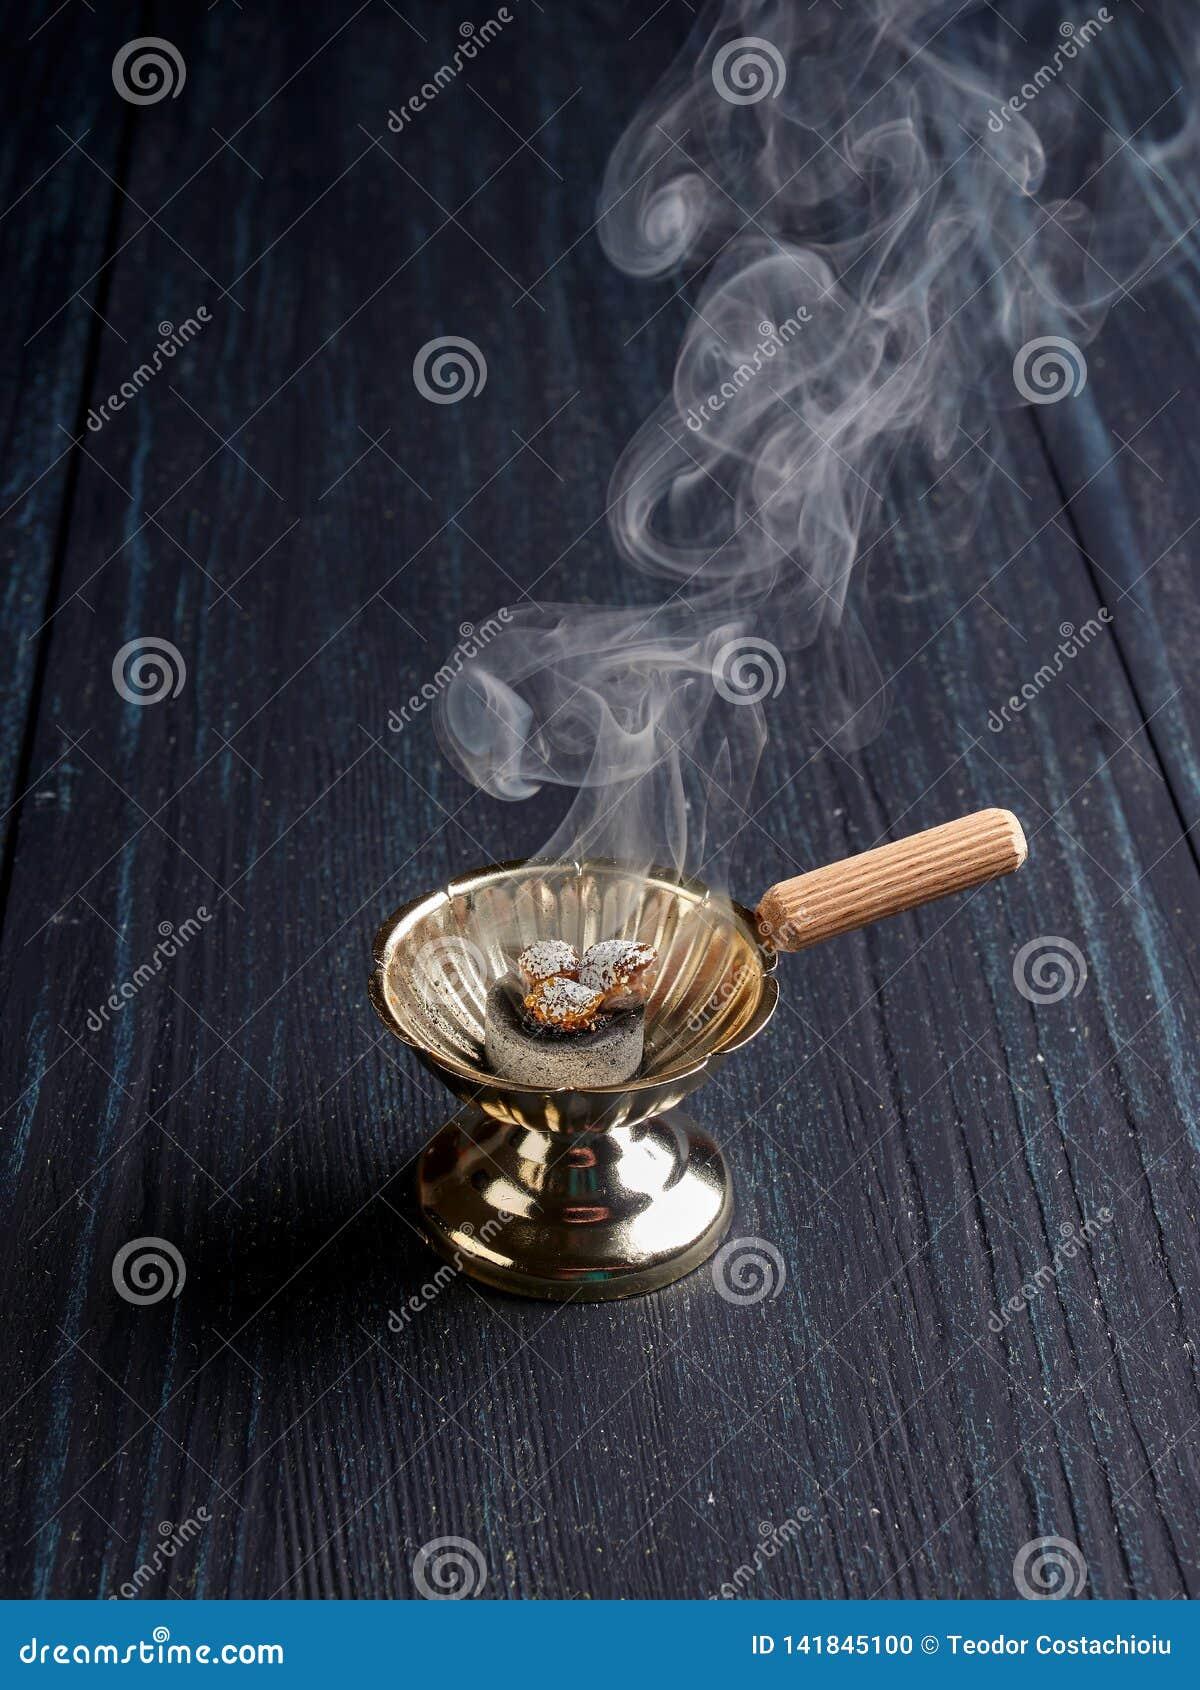 Burning Incense In A Simple Censer Stock Photo Image Of Burner Biblical 141845100